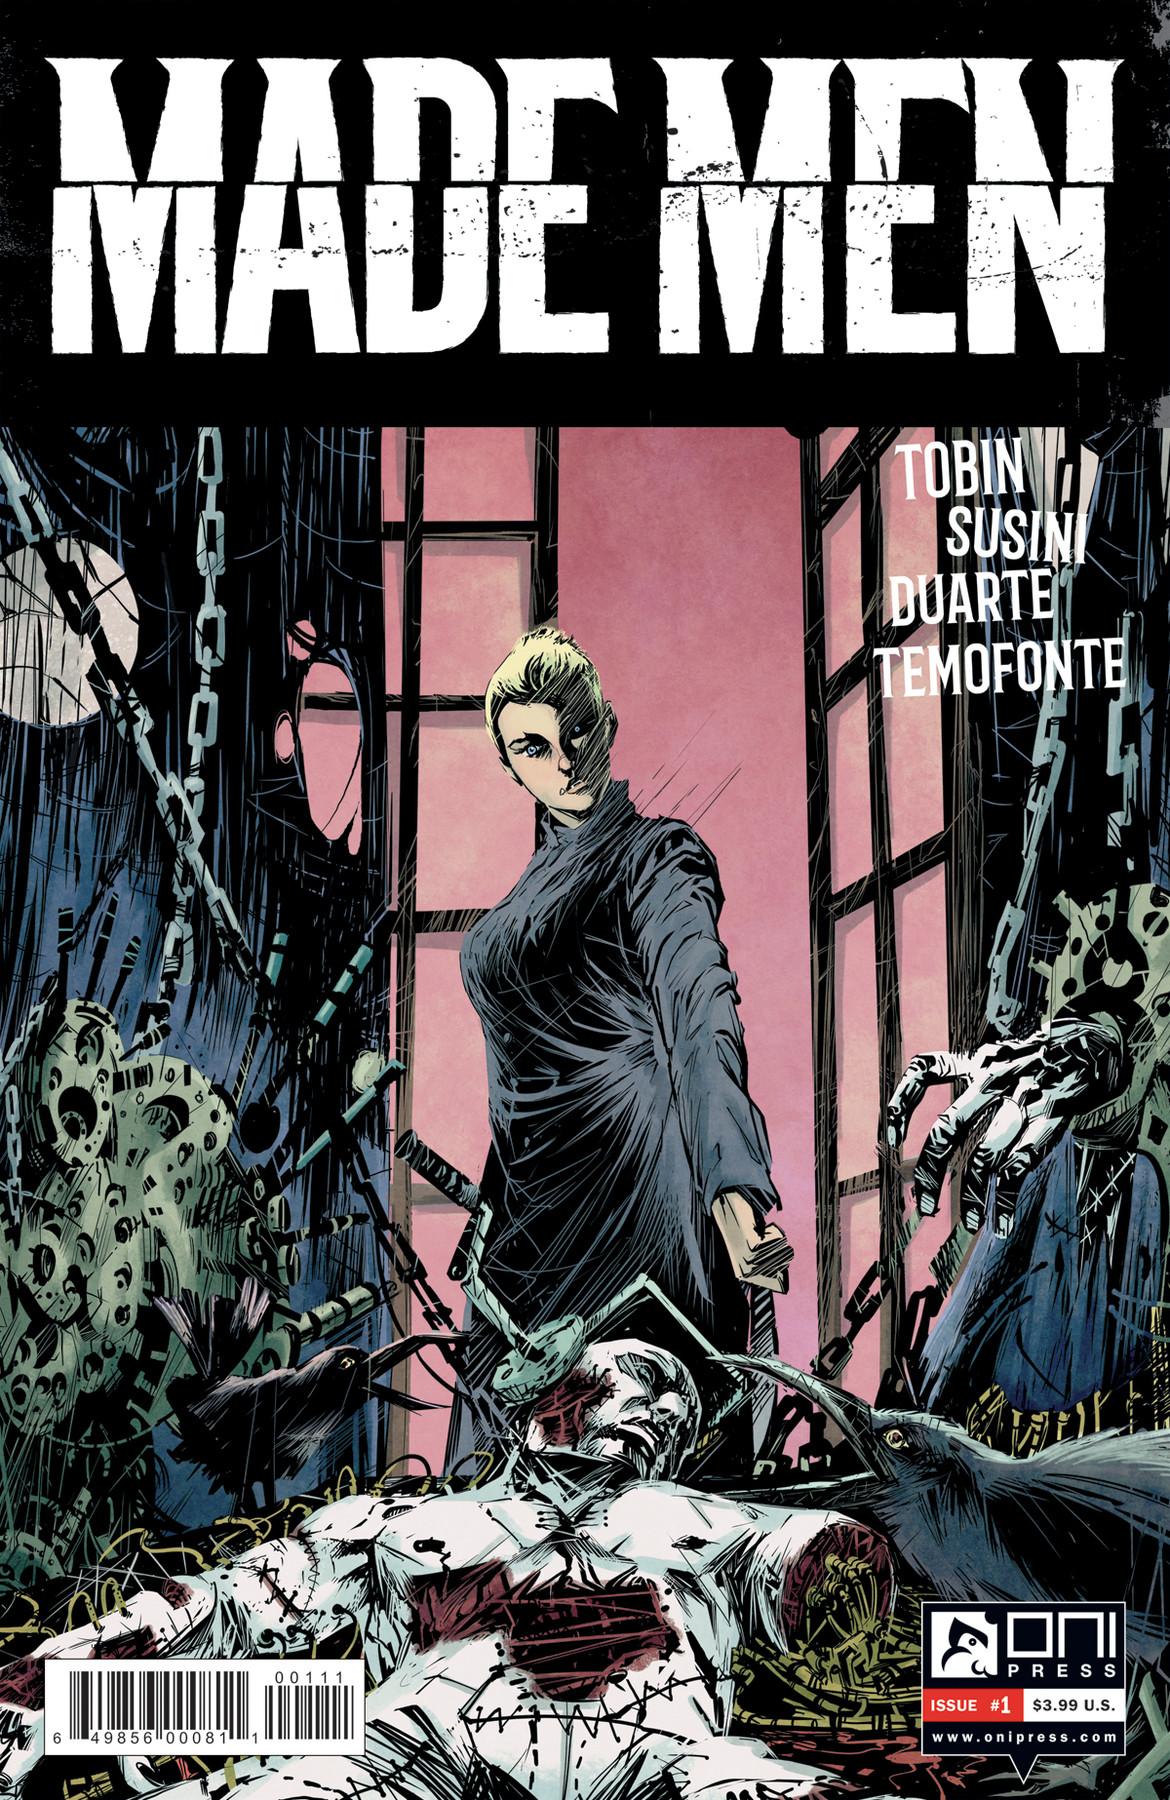 MADEMEN #1 - 4x6 COVER A SOLICIT WEB.jpg